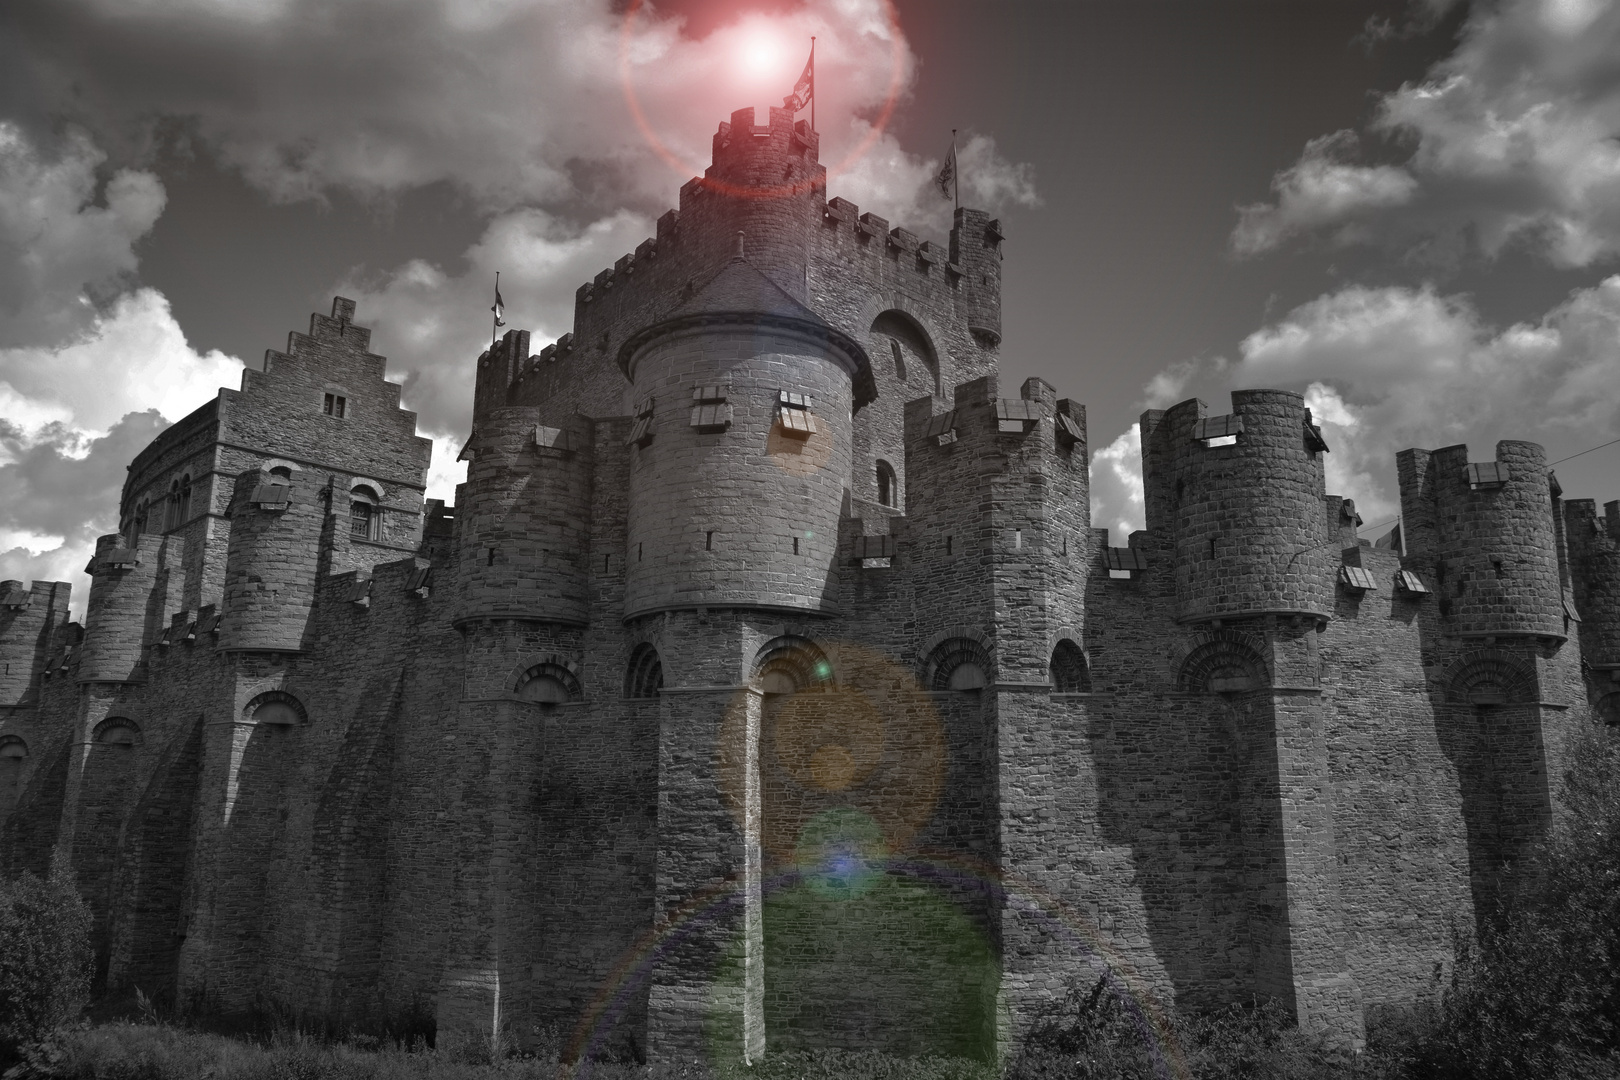 Genter Schloss in Belgien